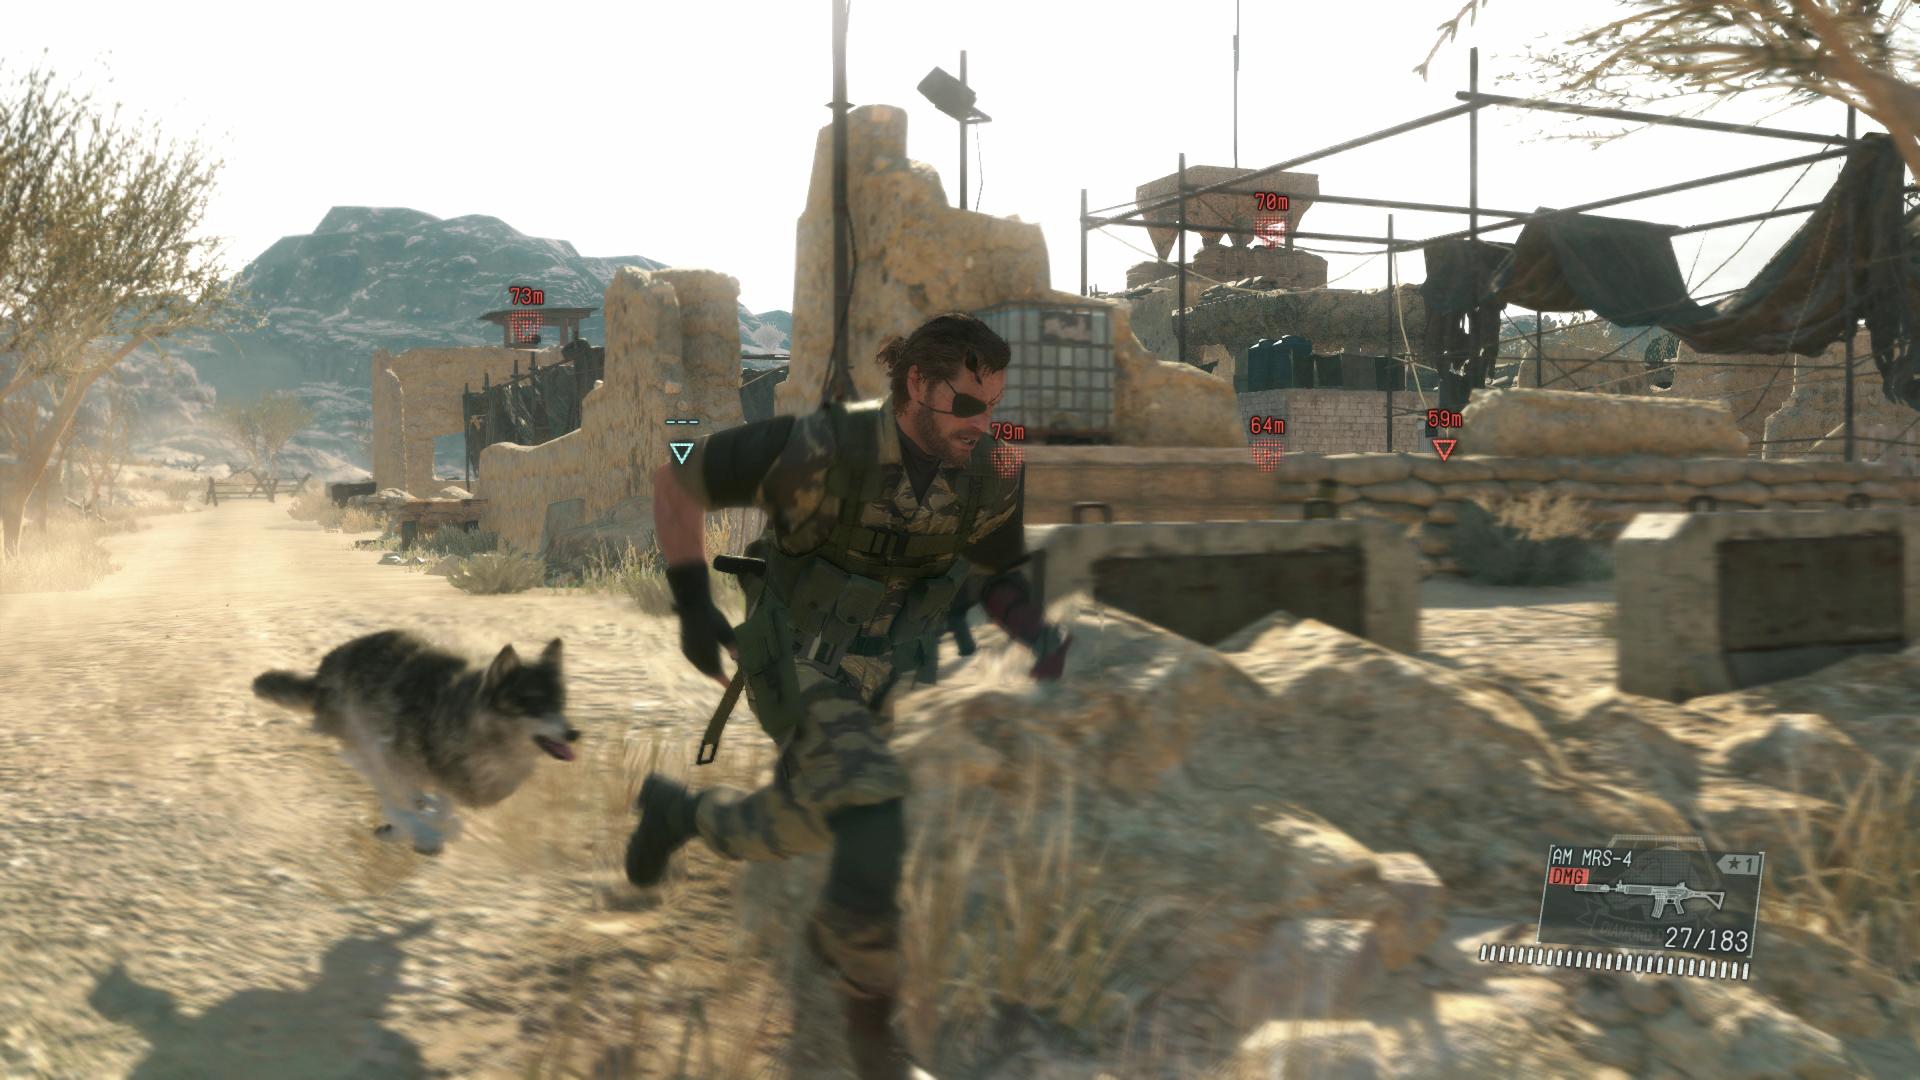 Metal Gear Solid V The Phantom Pain ESPAÑOL Descargar Full (CPY) + REPACK 5 DVD5 (JPW) 9